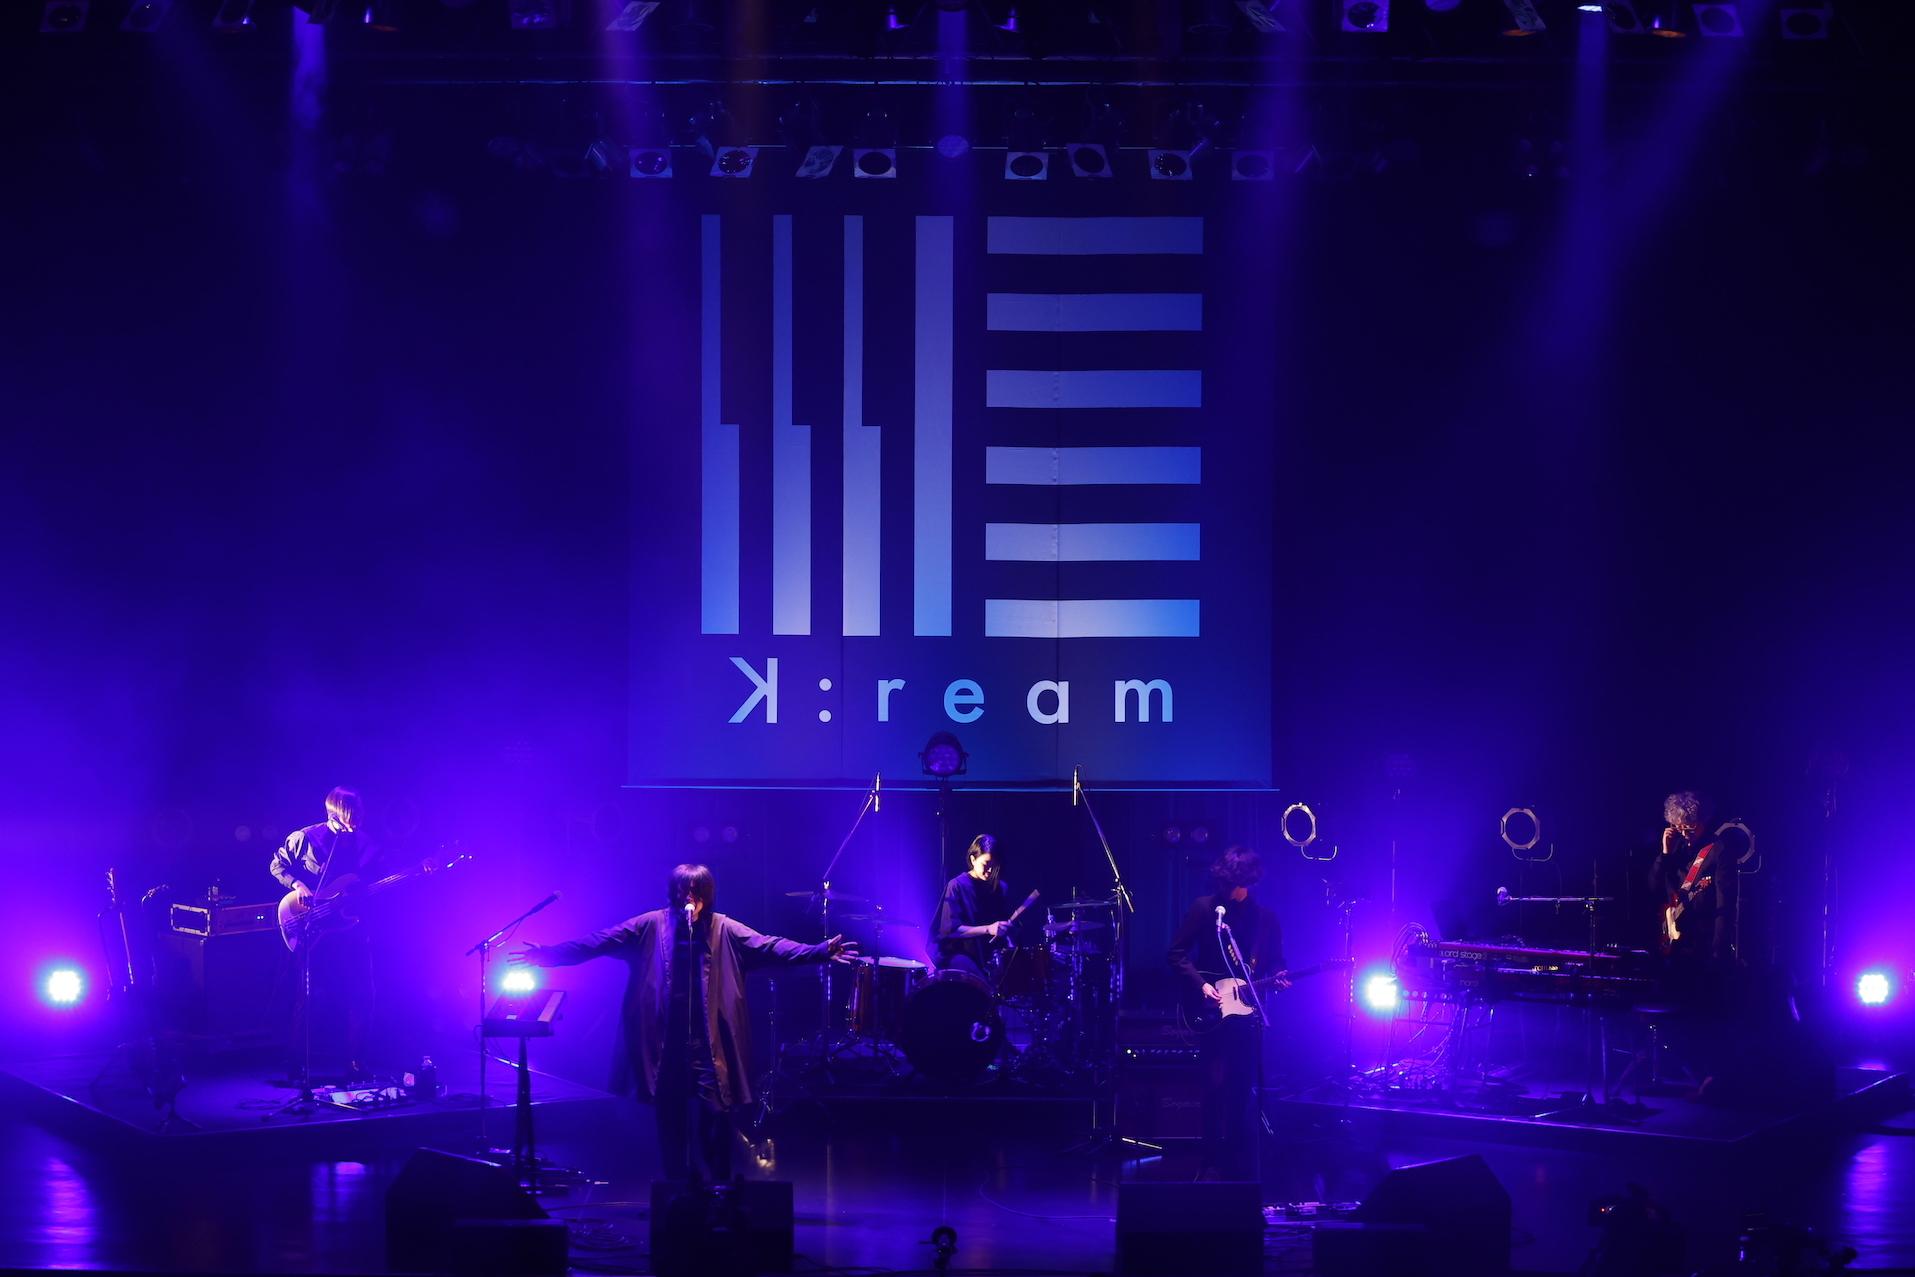 K:ream